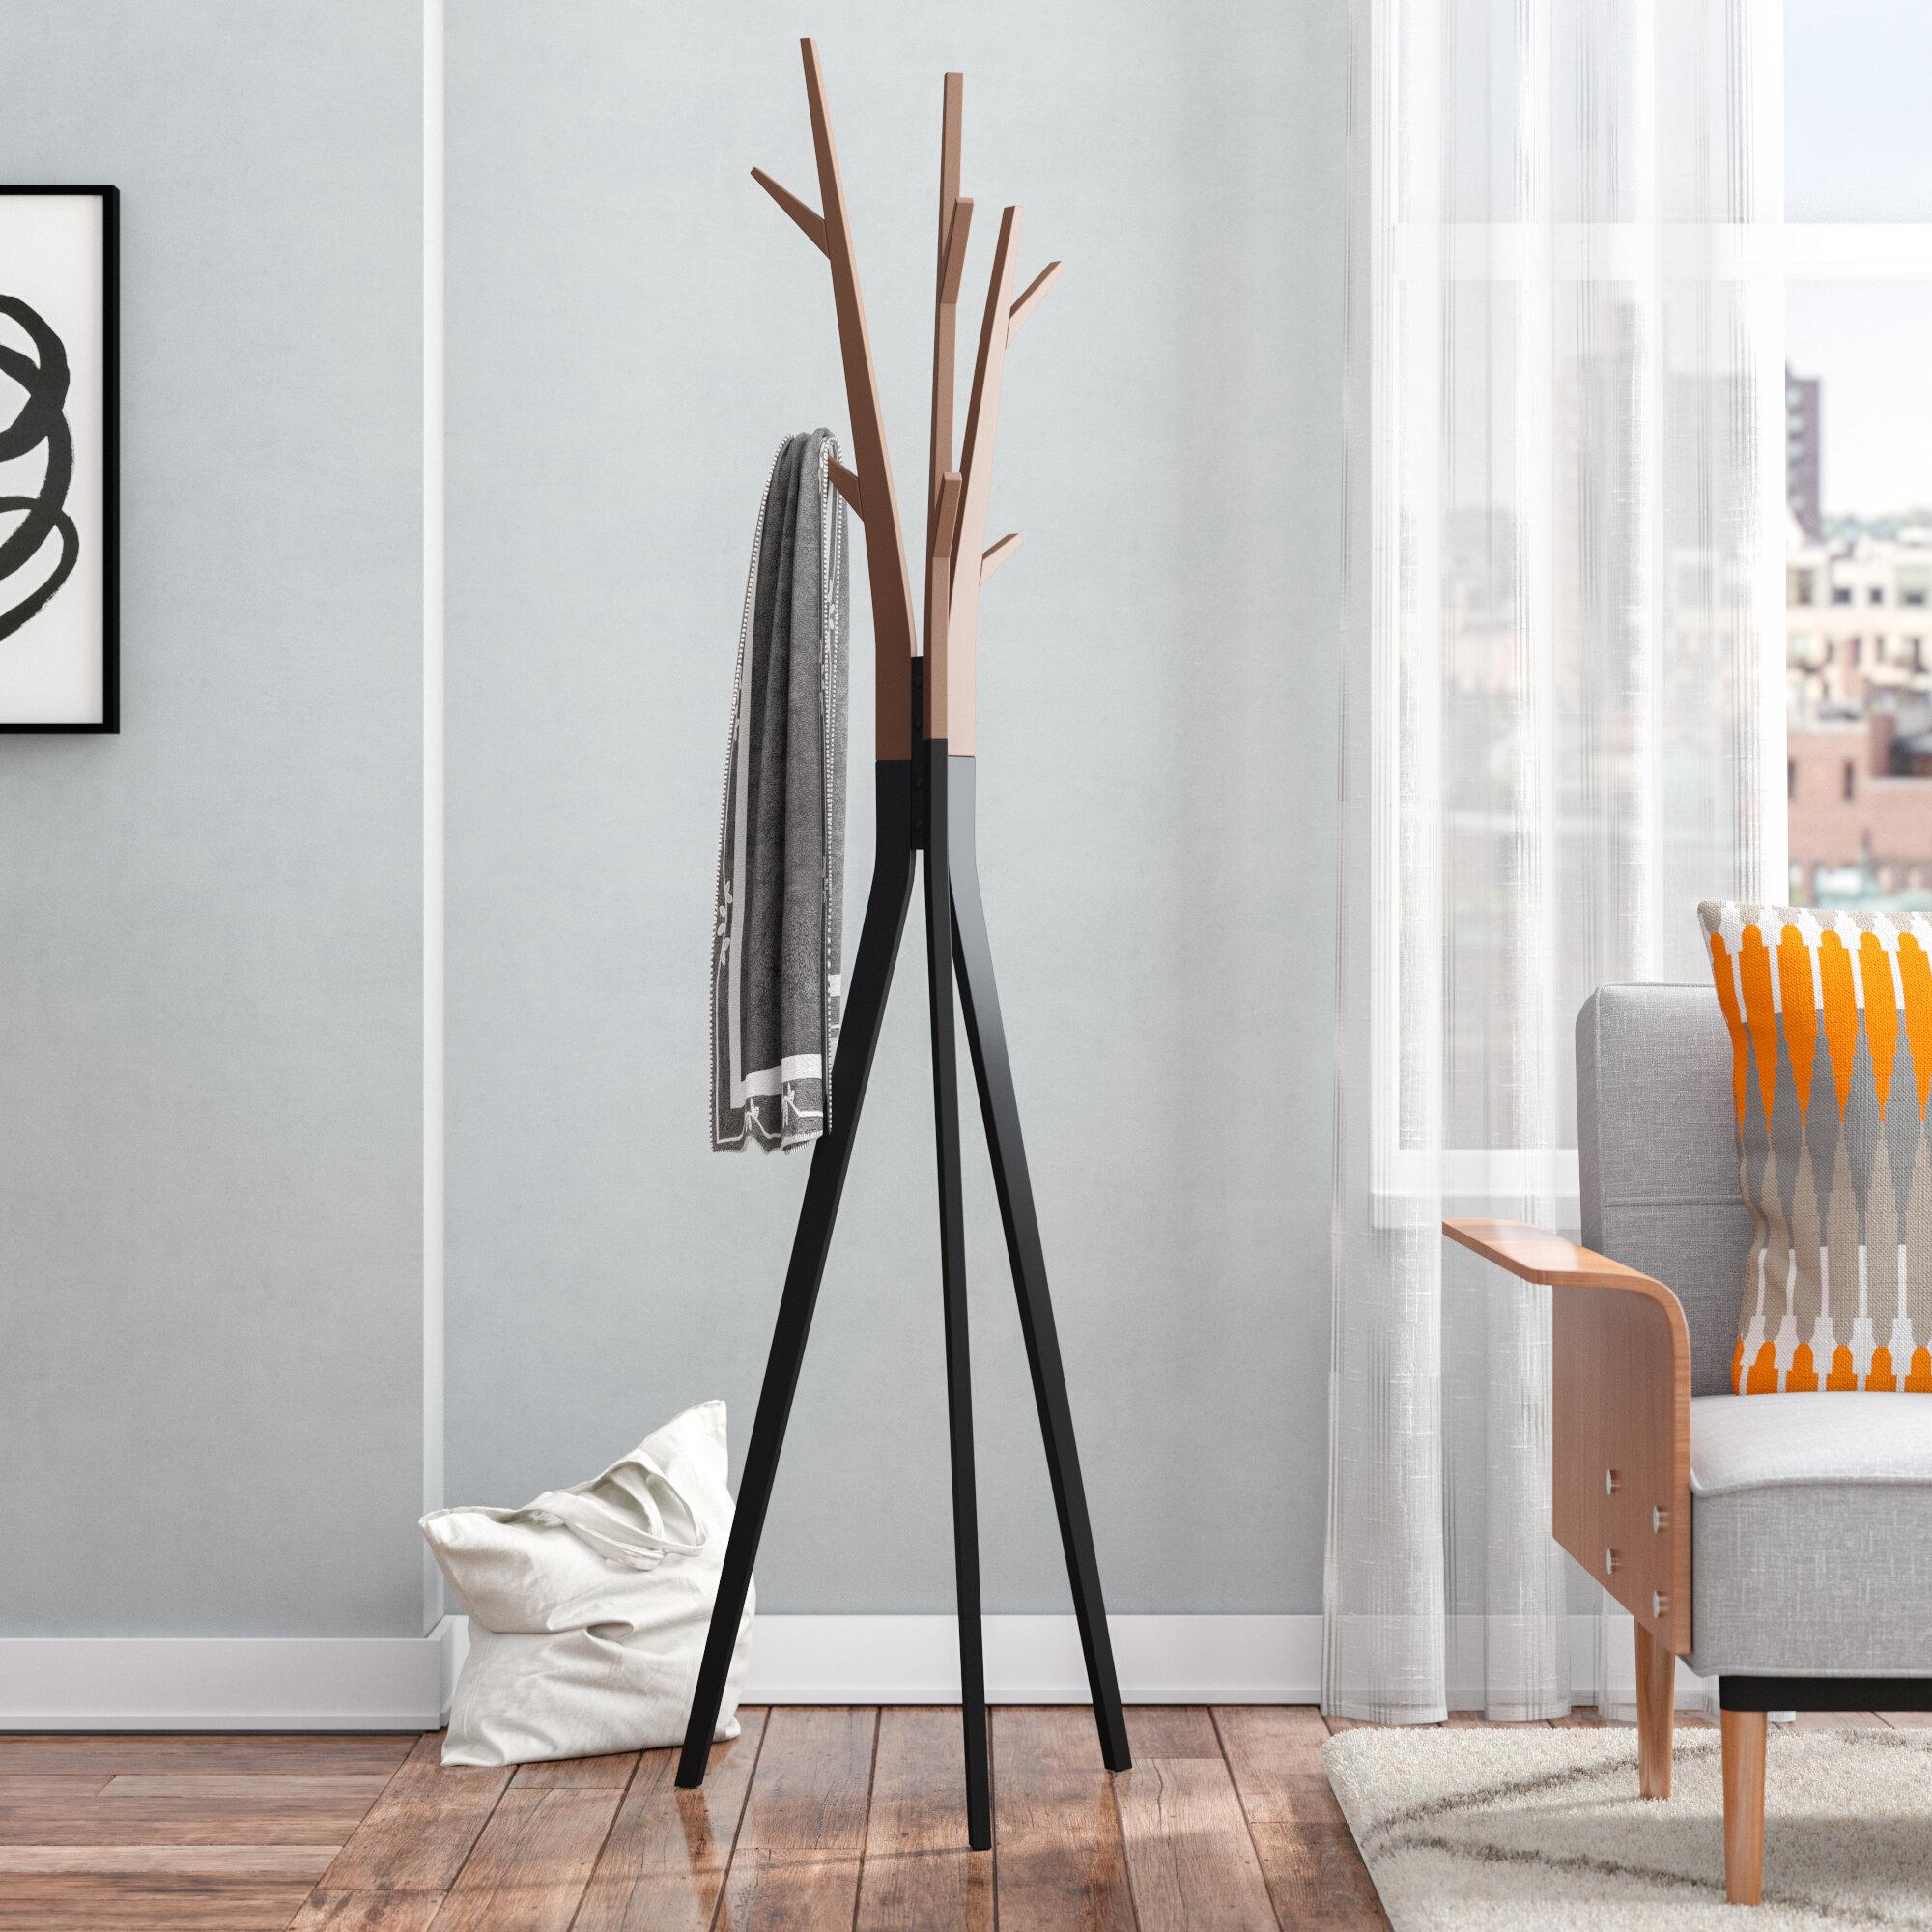 Freestanding Coat Racks You'll Love in 2020 | Wayfair